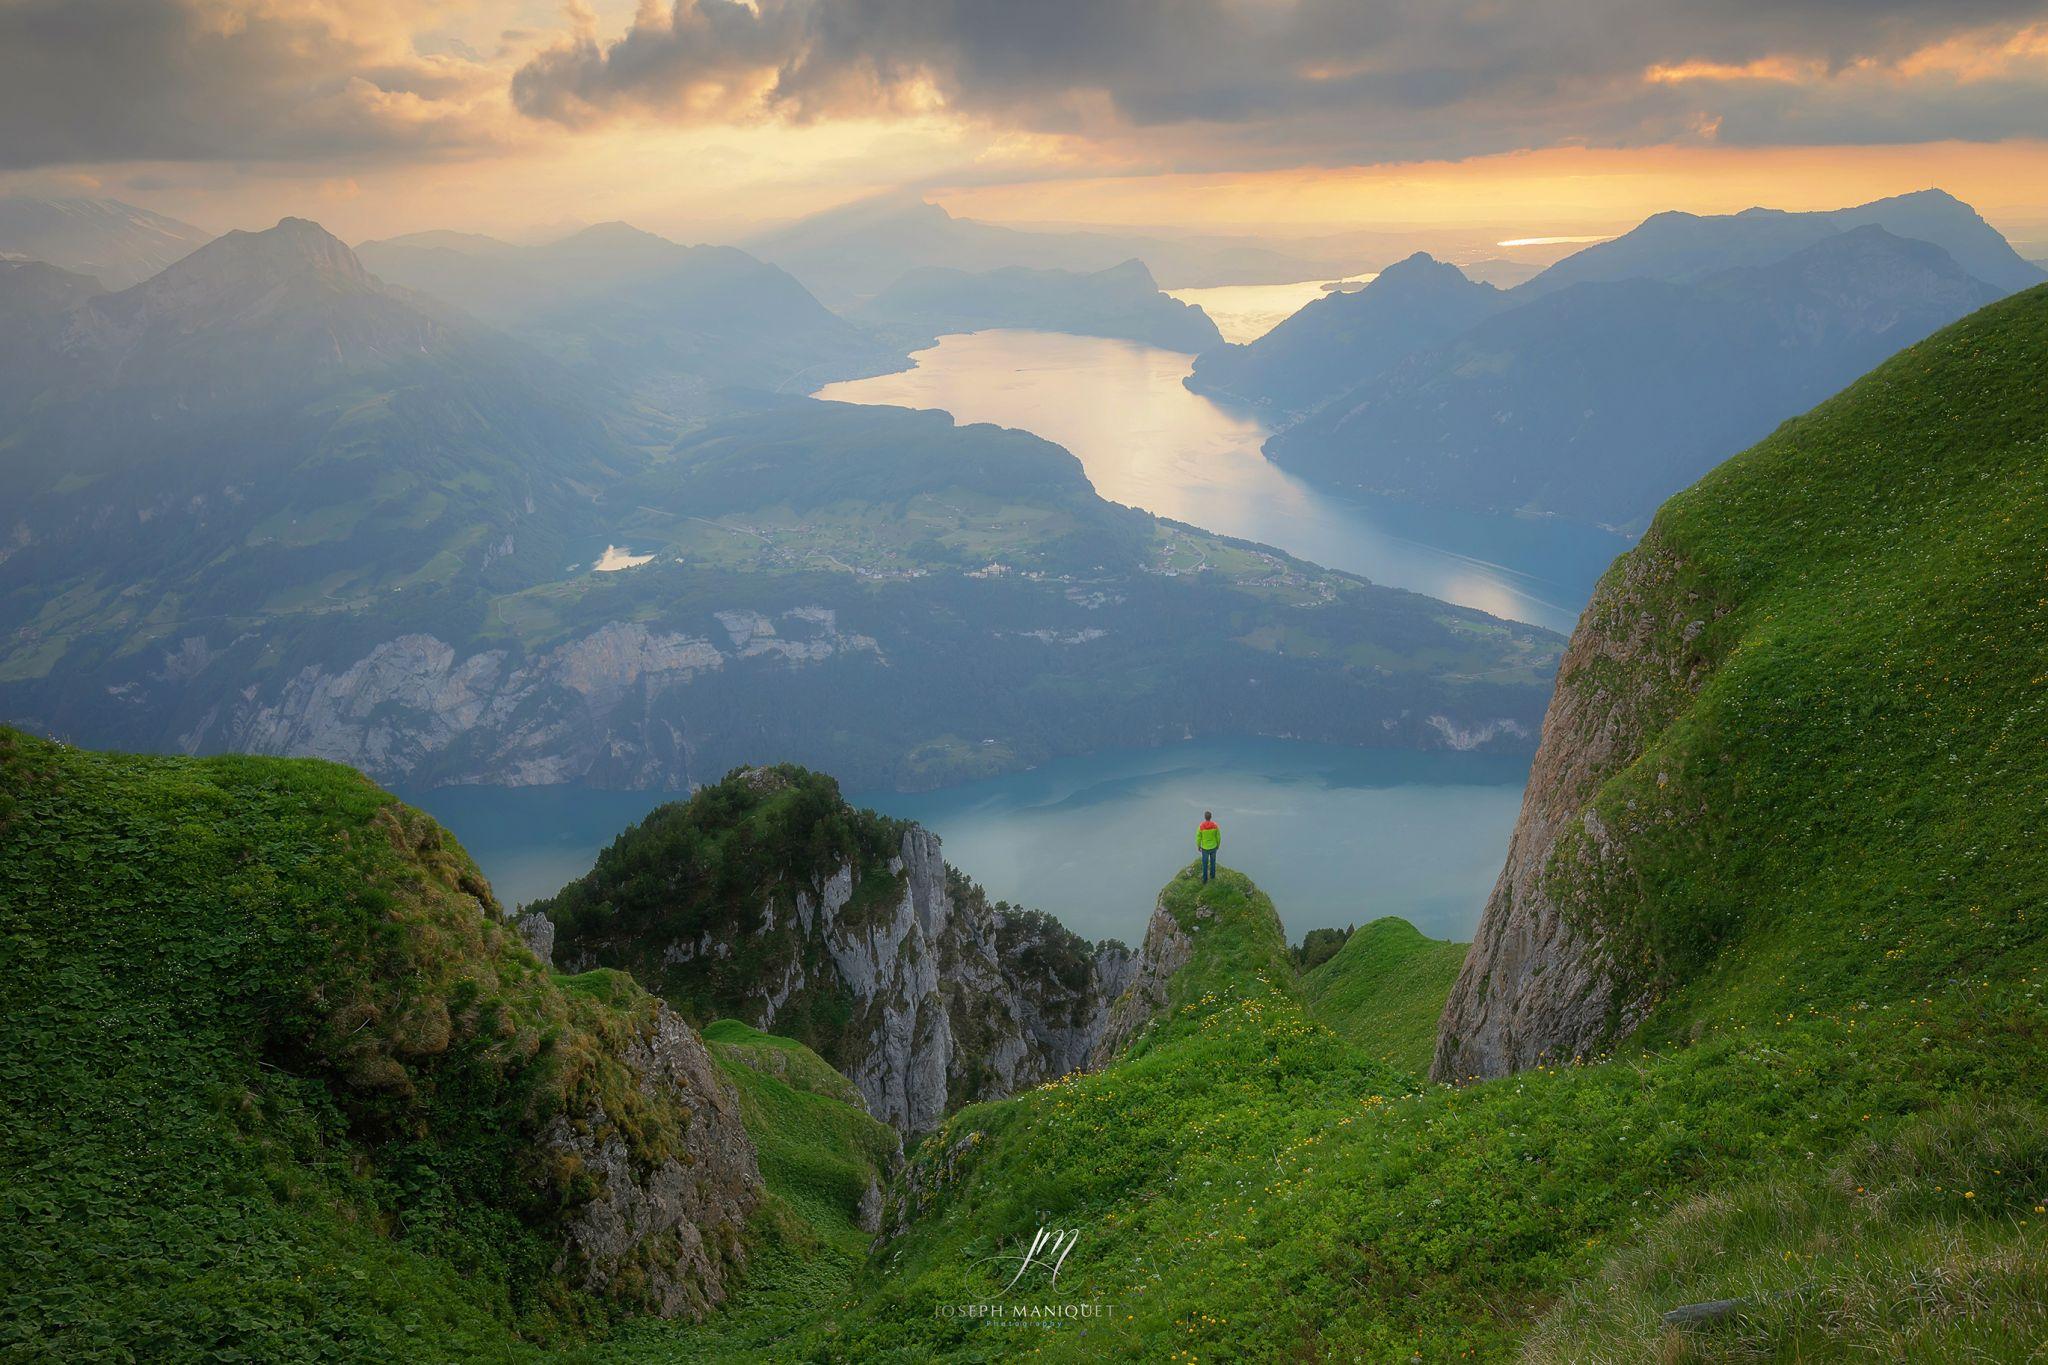 Fronalpstock, Switzerland